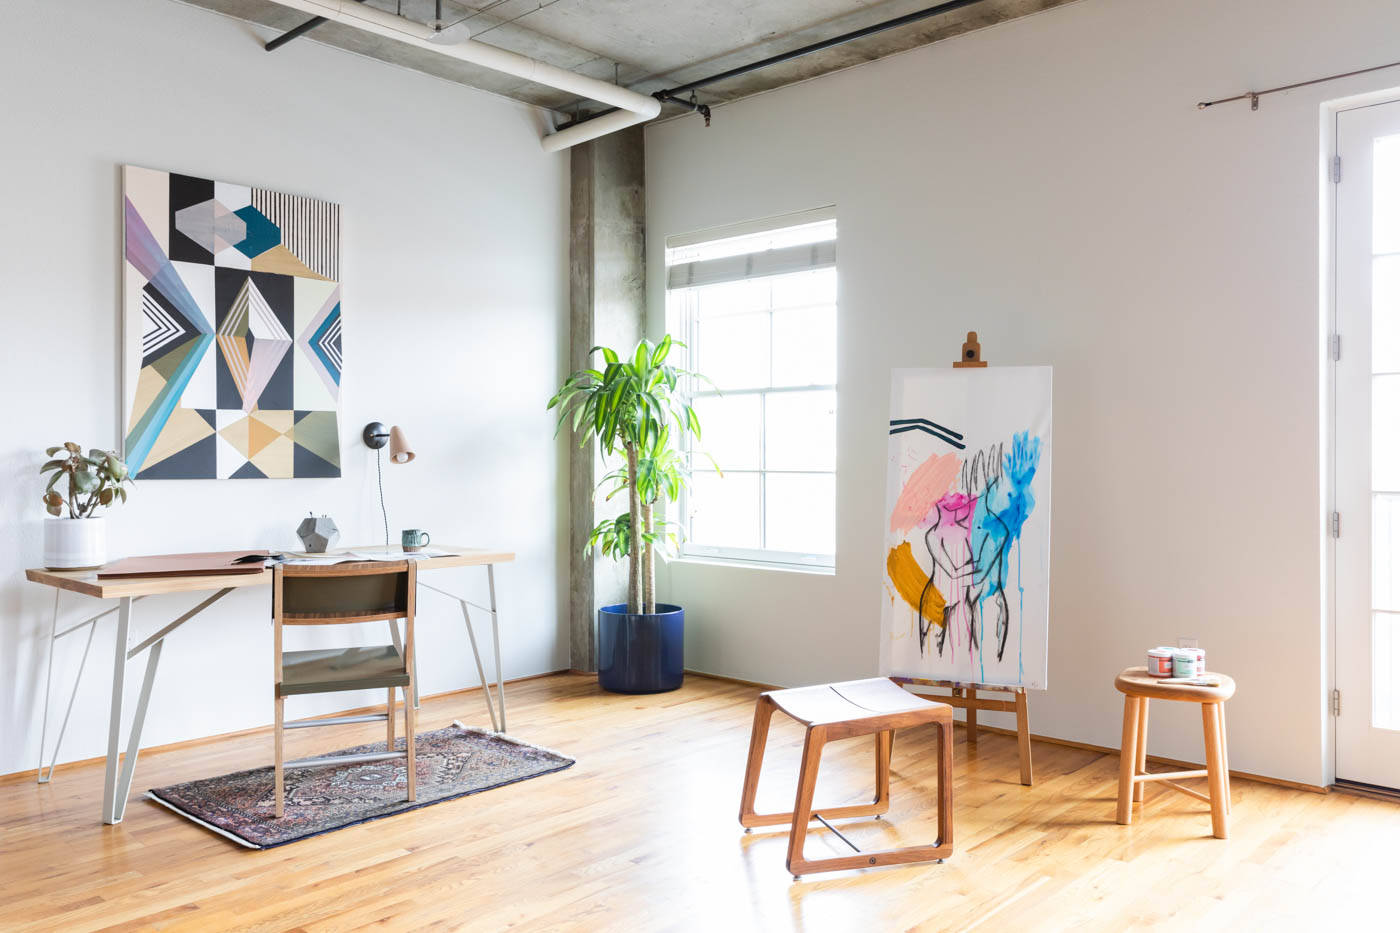 ArtistLoft-DenverCO-natural-light-photography-studio-lifestyle-photoshoot-location-editorial-commercial-photography-1.jpg